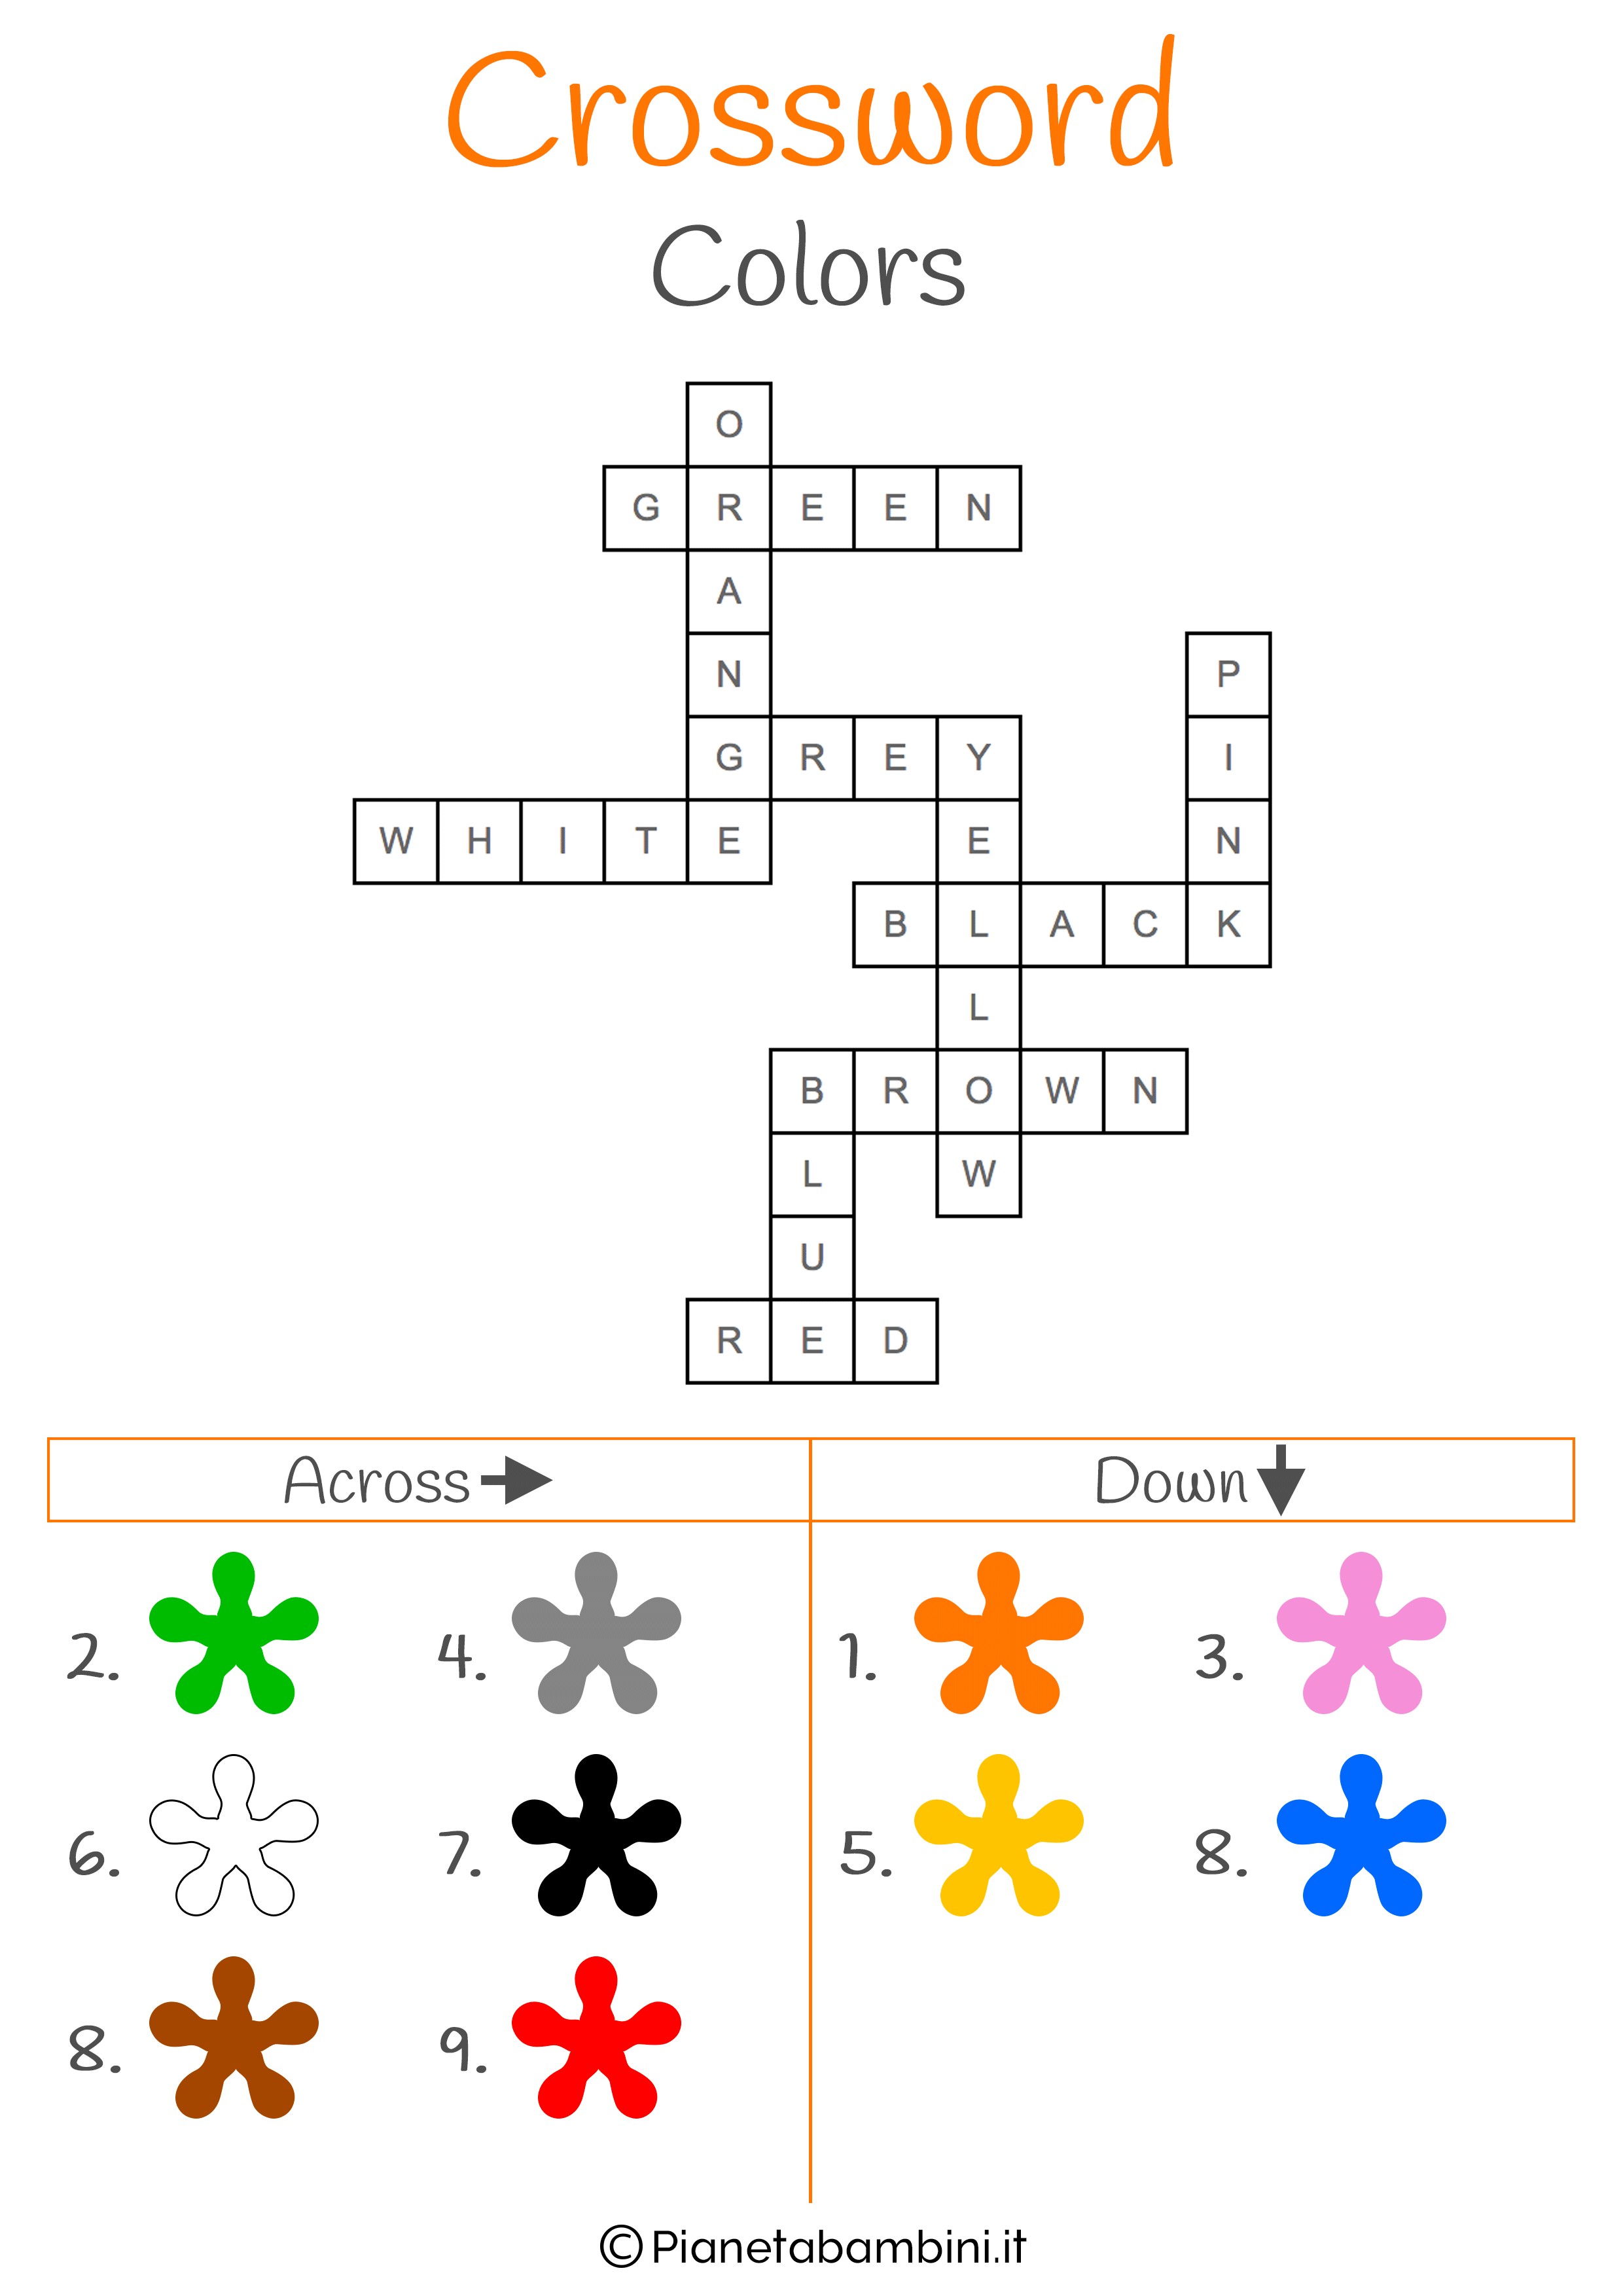 Soluzione al cruciverba in inglese sui colori